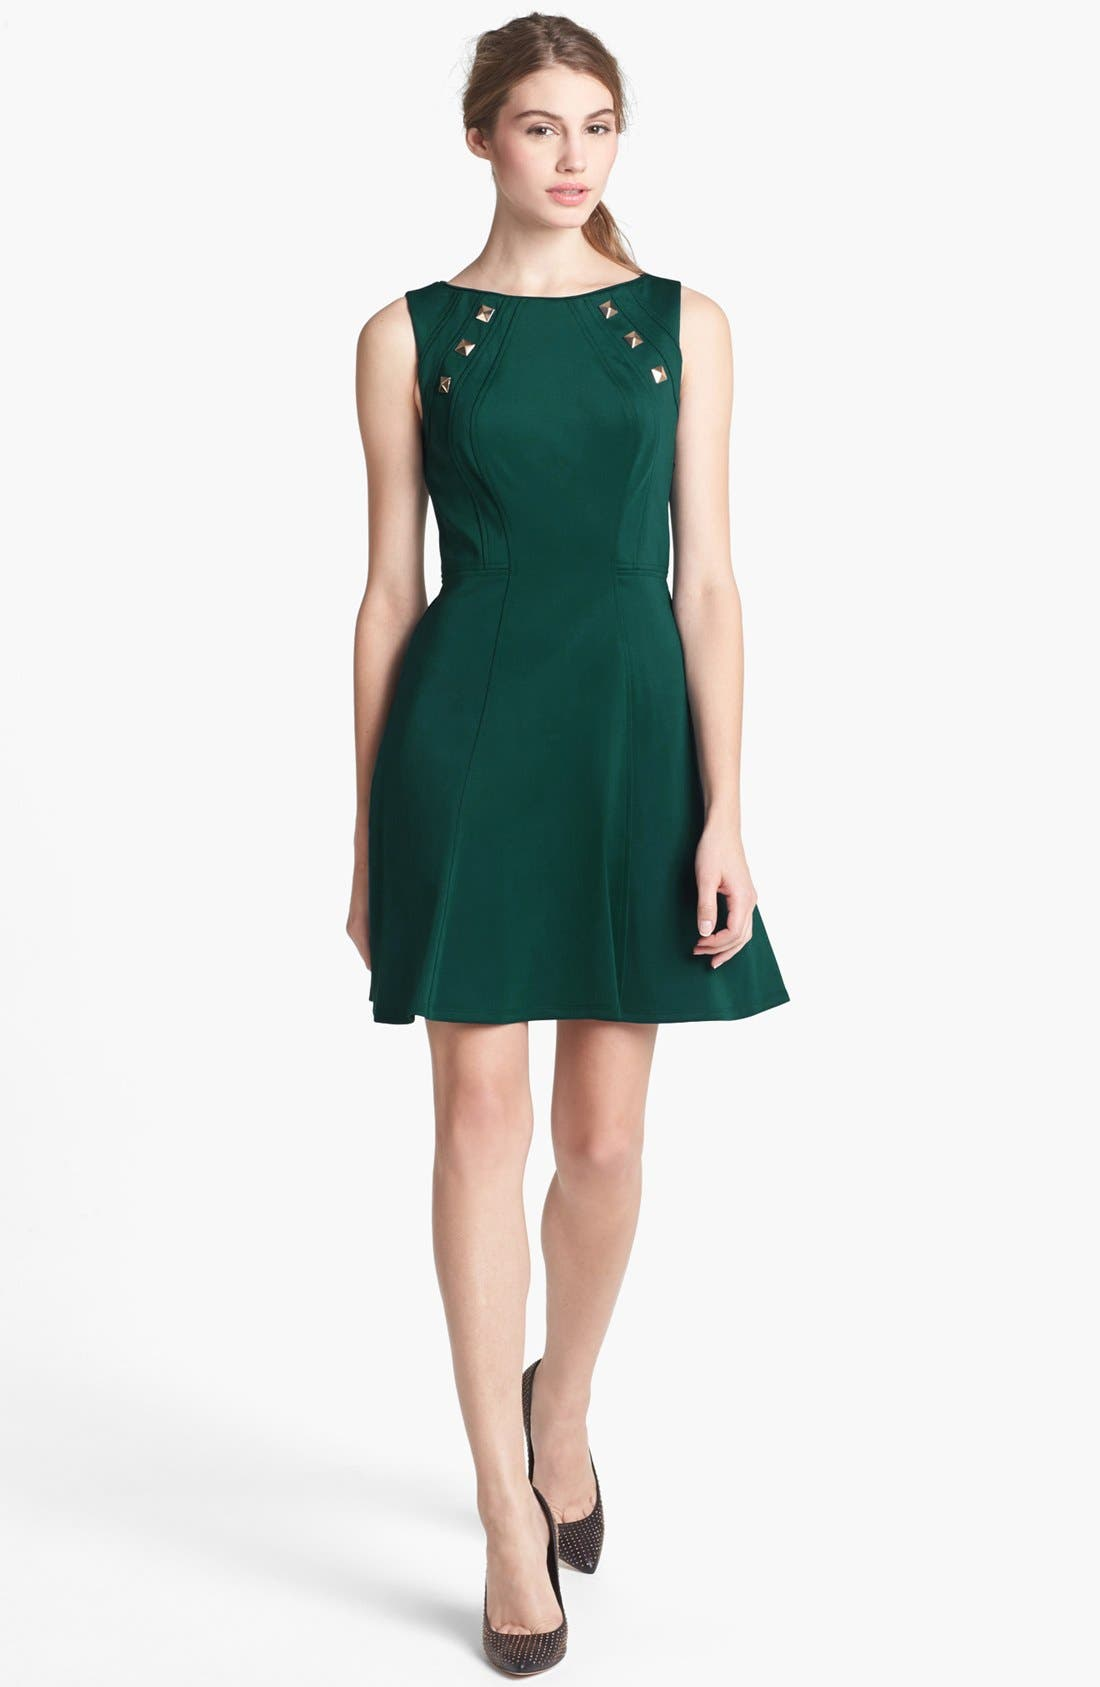 Alternate Image 1 Selected - Vince Camuto Studded Scuba Knit Fit & Flare Dress